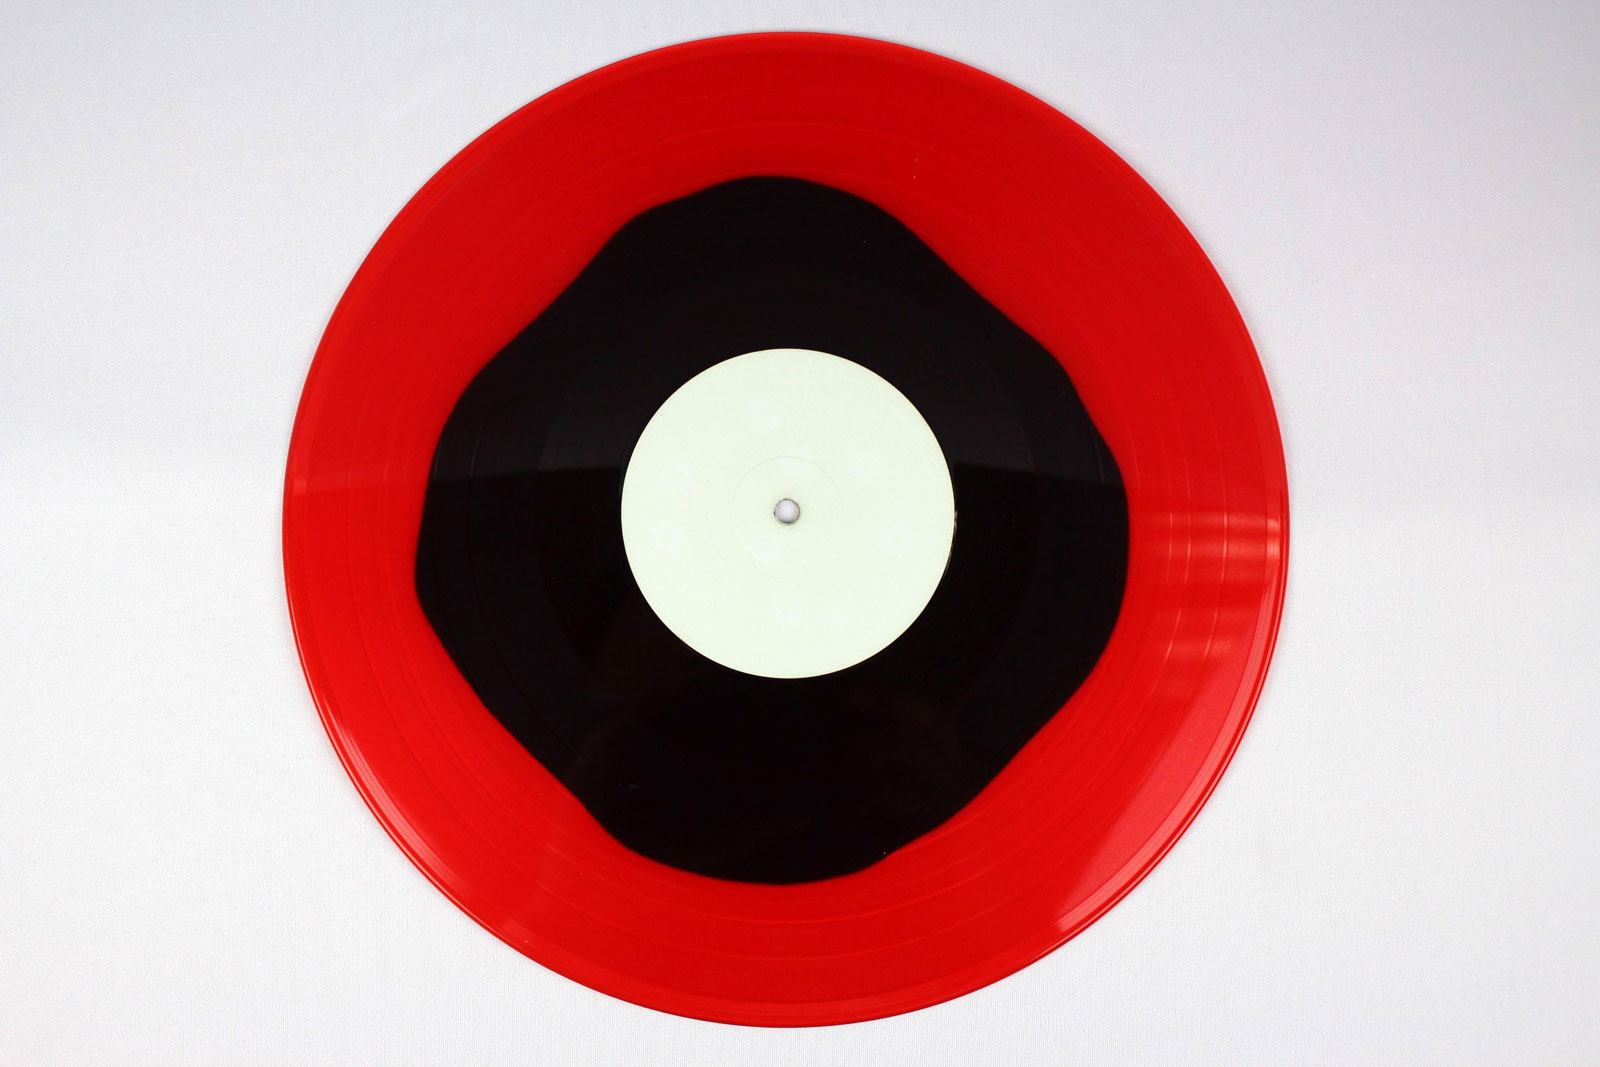 red transparent / coloured circle: black